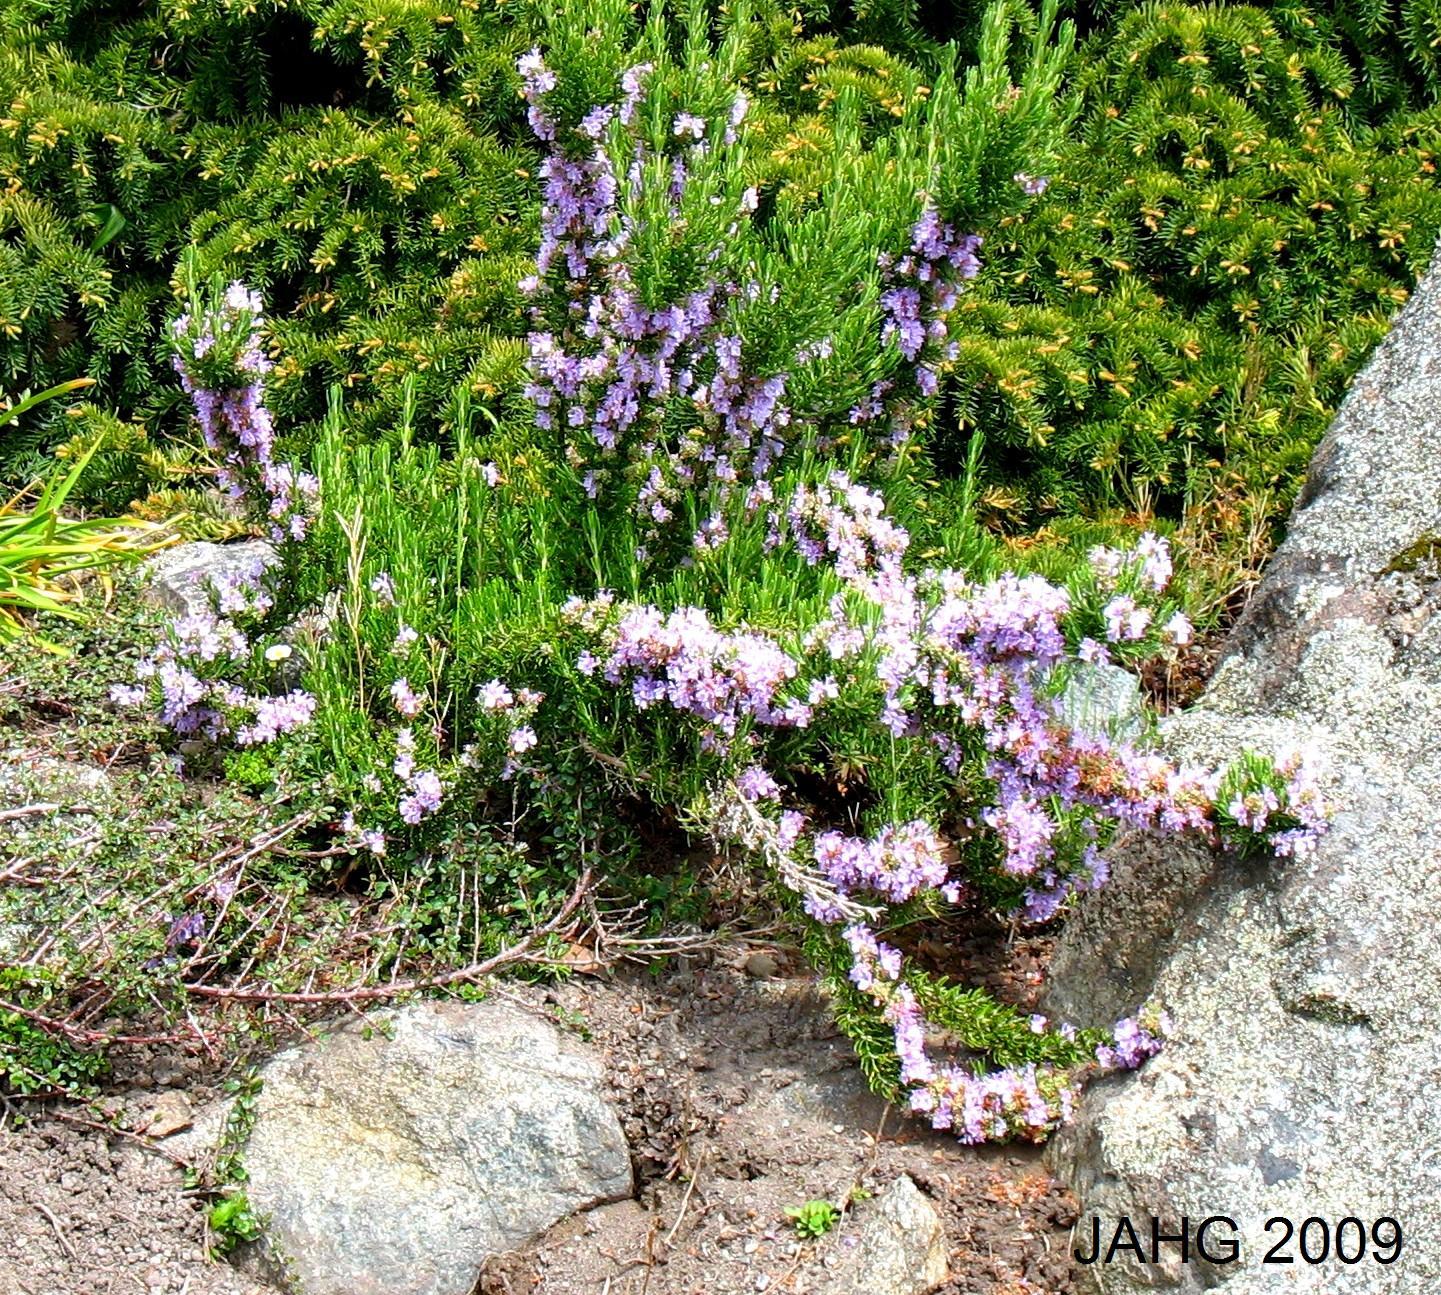 A Pink Flowering Rosemary, Probably Rosmarinus officinalis 'Roseus'